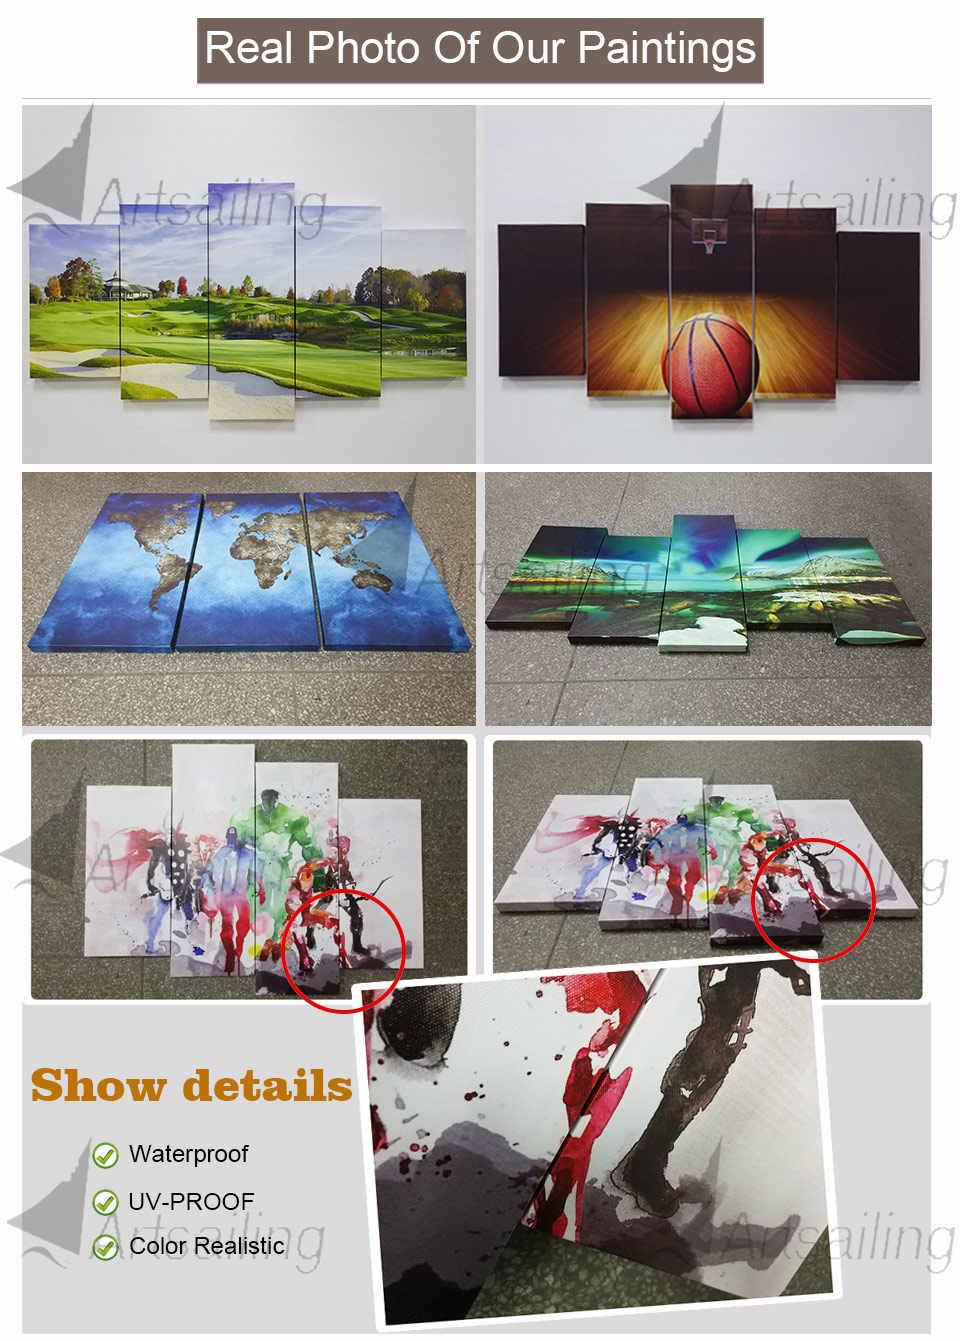 HD Gedruckt 1 Stück foto bild Benutzerdefinierte Malerei auf Leinwand benutzerdefinierte Wand Bilder druck malerei wand kunst dekoration dropshipping